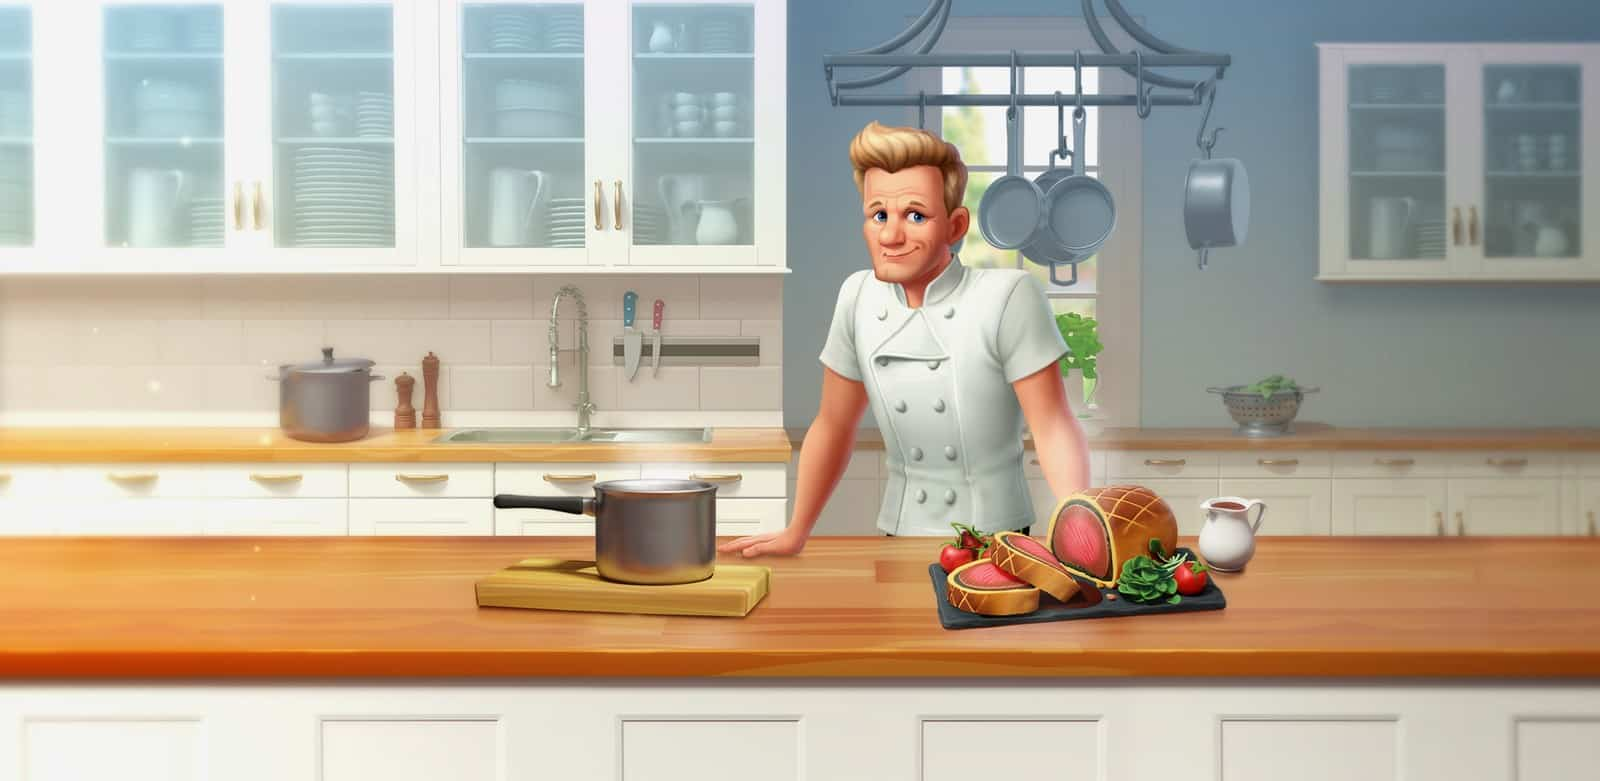 Gordon Ramsay's Chef Blast promotional image